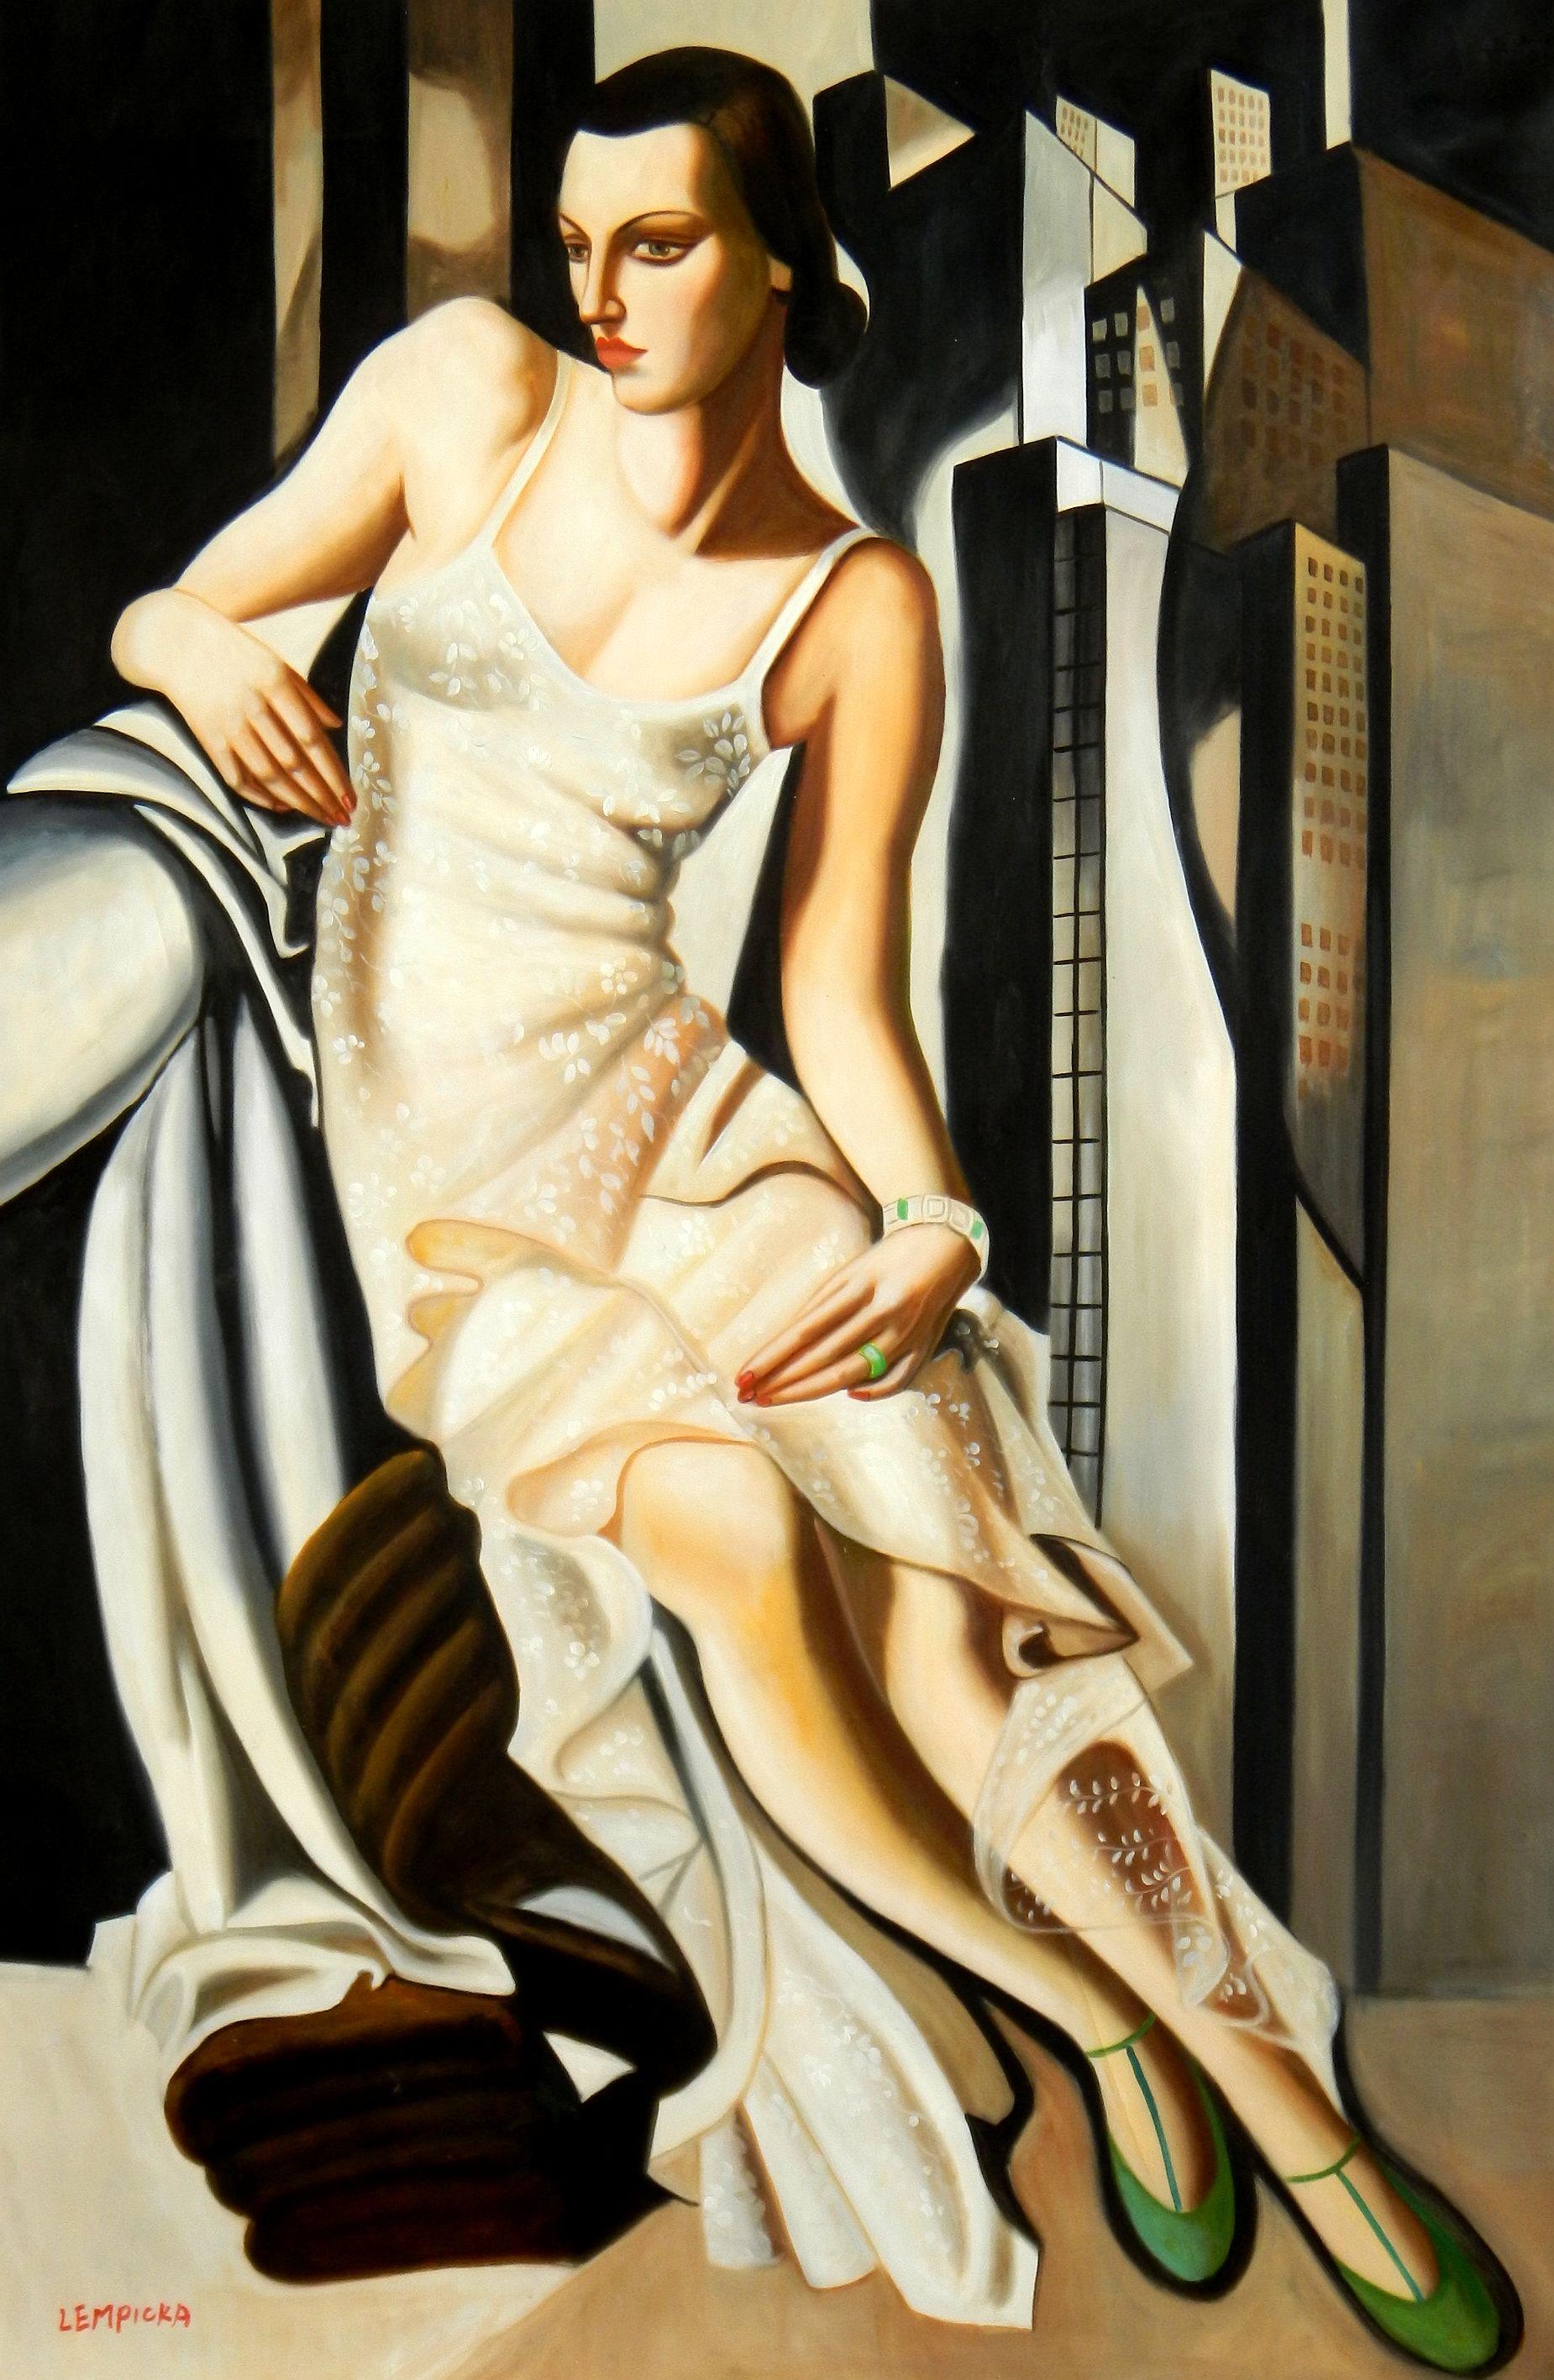 Homage of T. de Lempicka - Portrait der Madame Allan Bott p92548 120x180cm Ölbild handgemalt